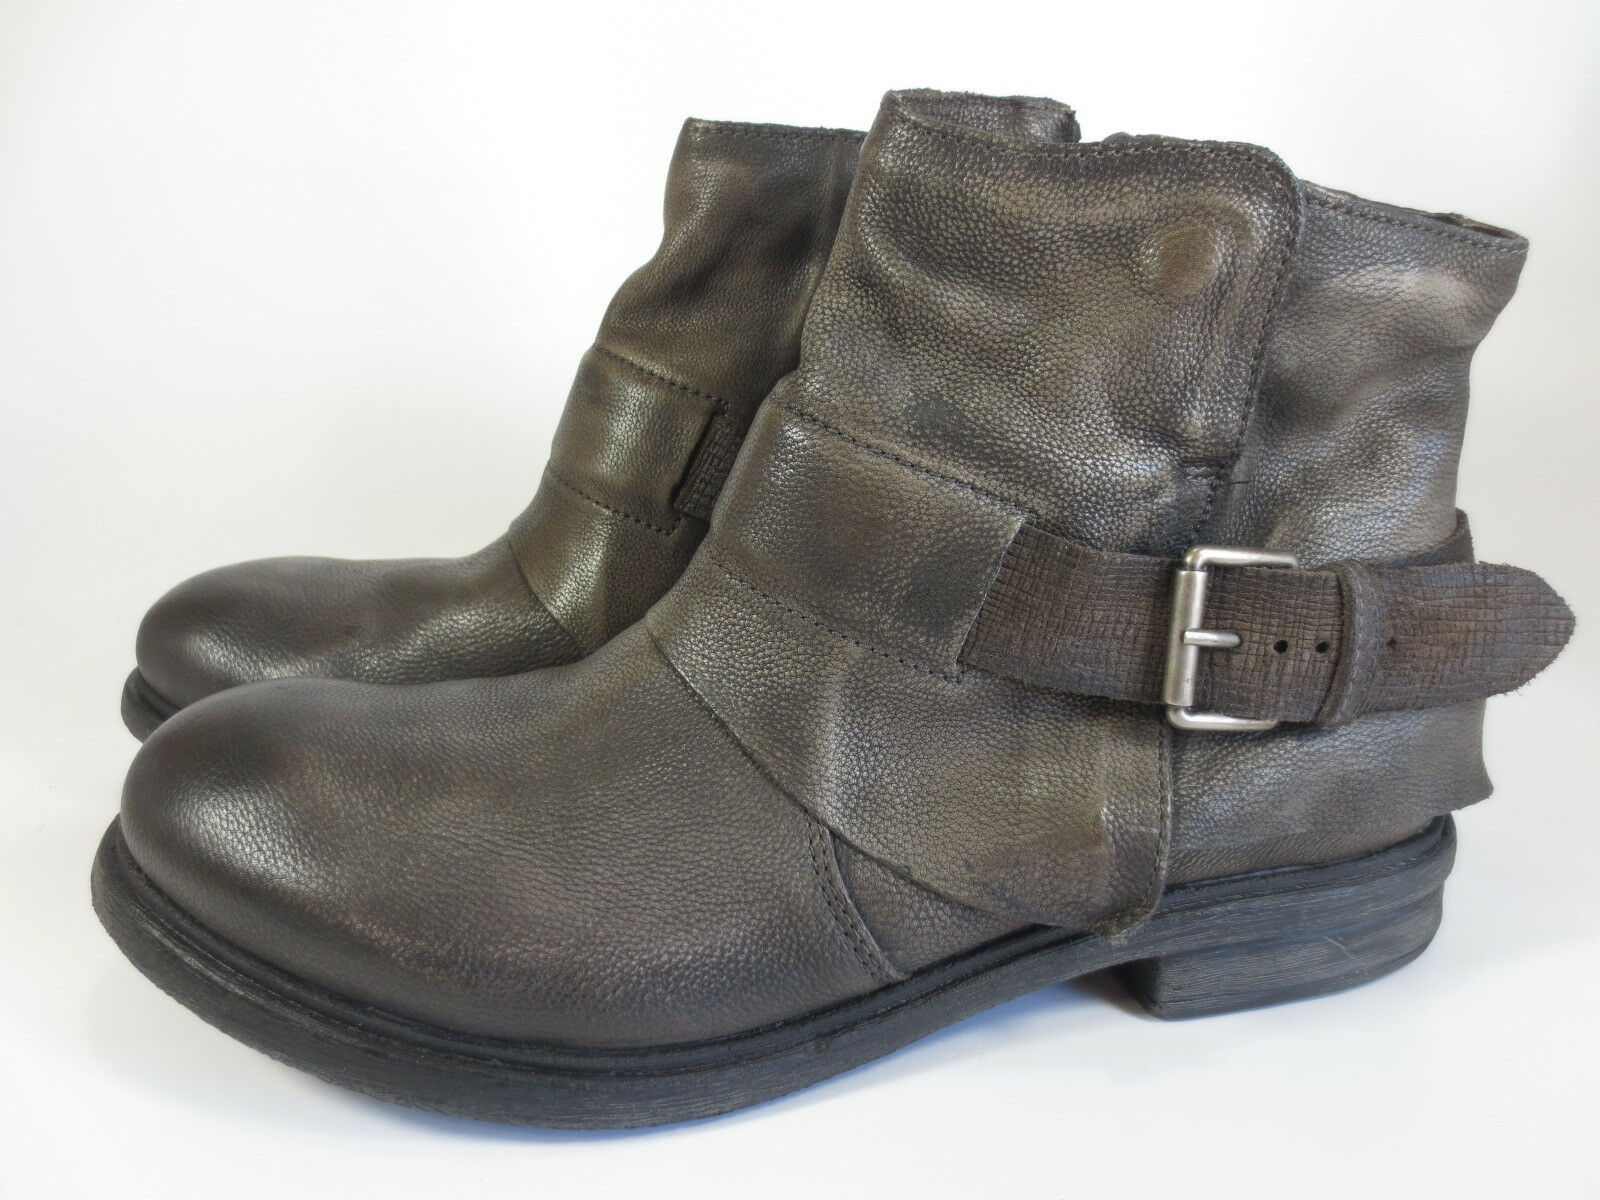 PETROLIO lässige Leder Schuhe Stiefel grau used Lederfutter Gr. 46 NEU 140,00